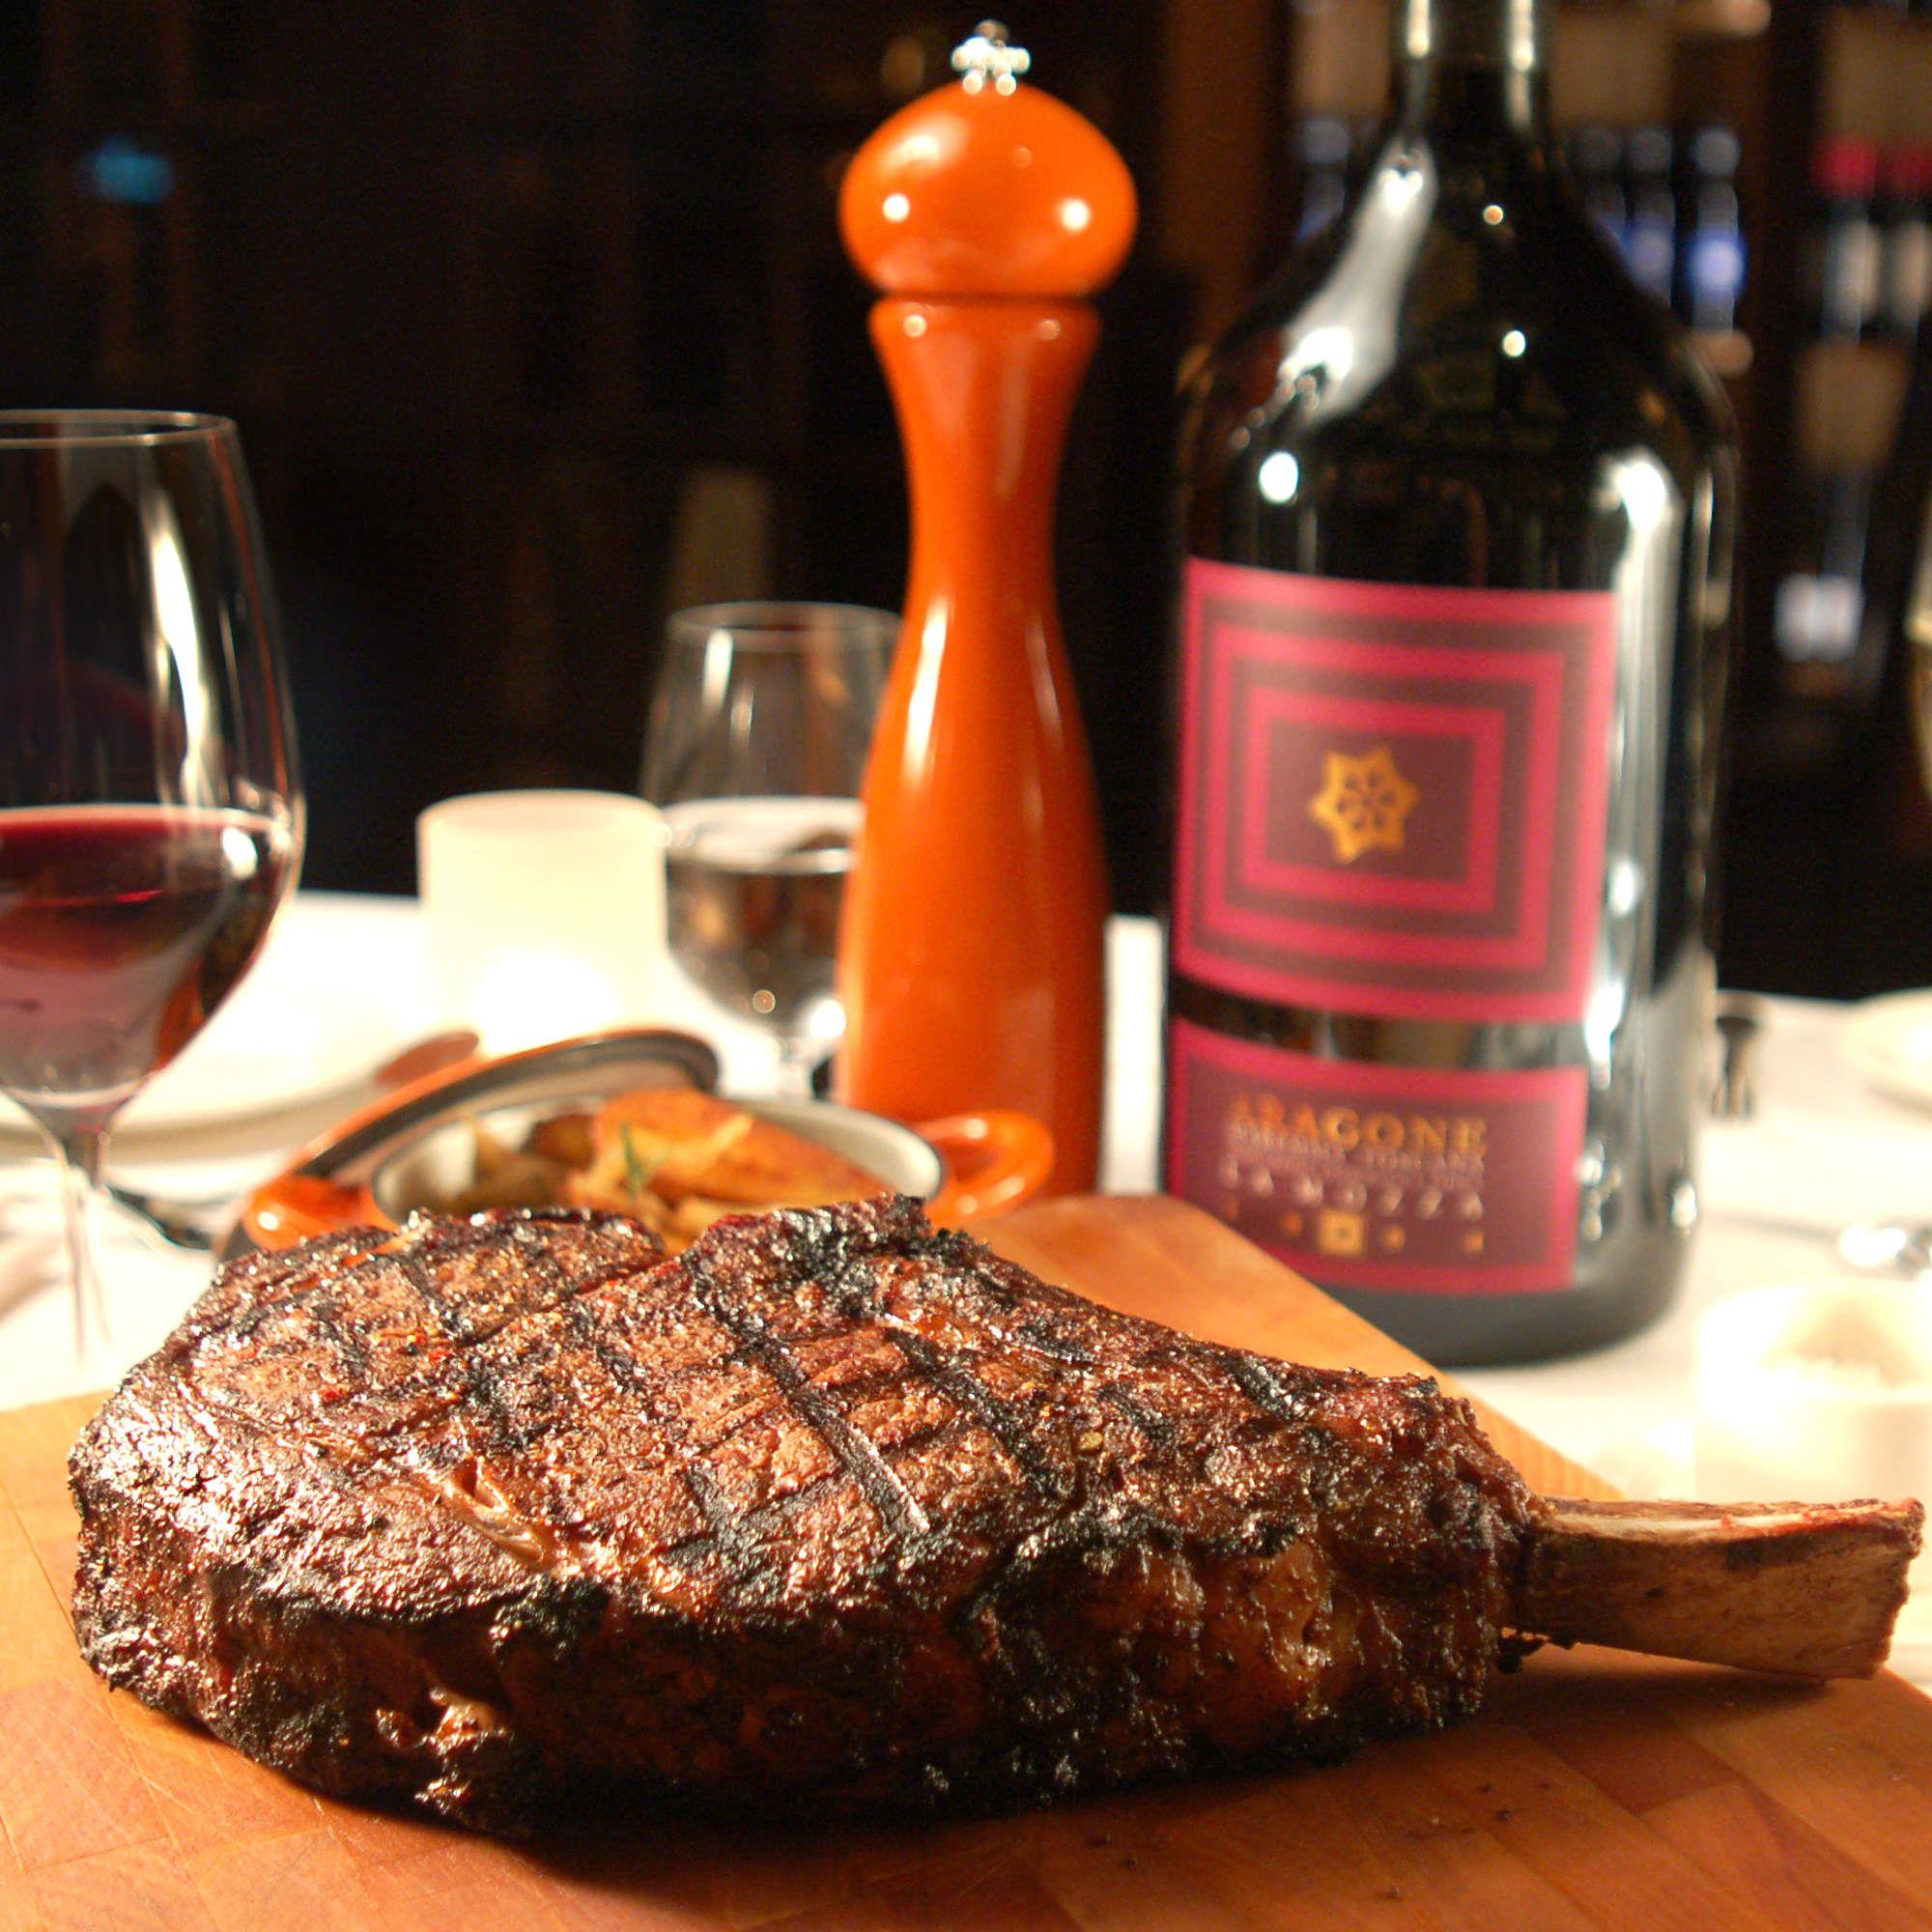 Power Ranking The Top 8 Steakhouses In Las Vegas Las Vegas Eats Steak Las Vegas Las Vegas Hotels